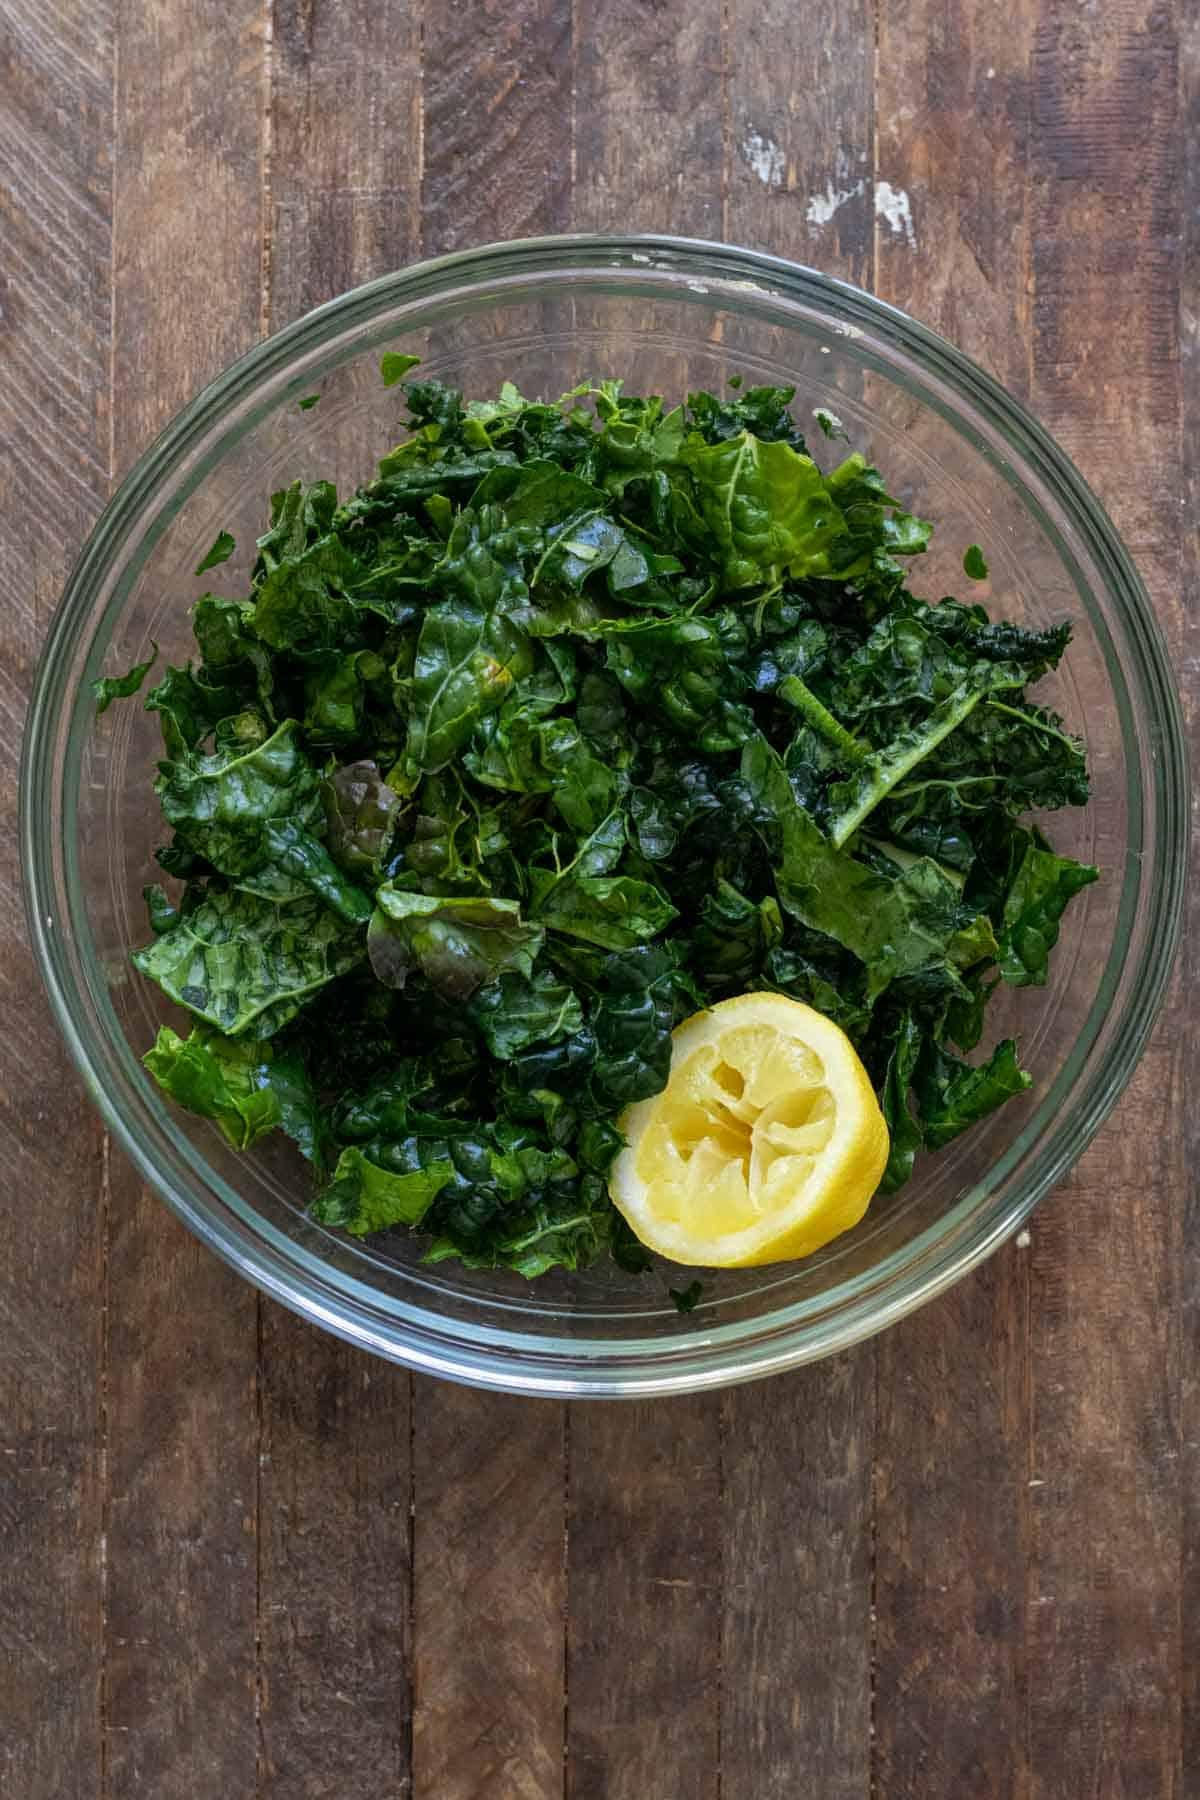 Kale in glass bowl massaged with lemon juice.